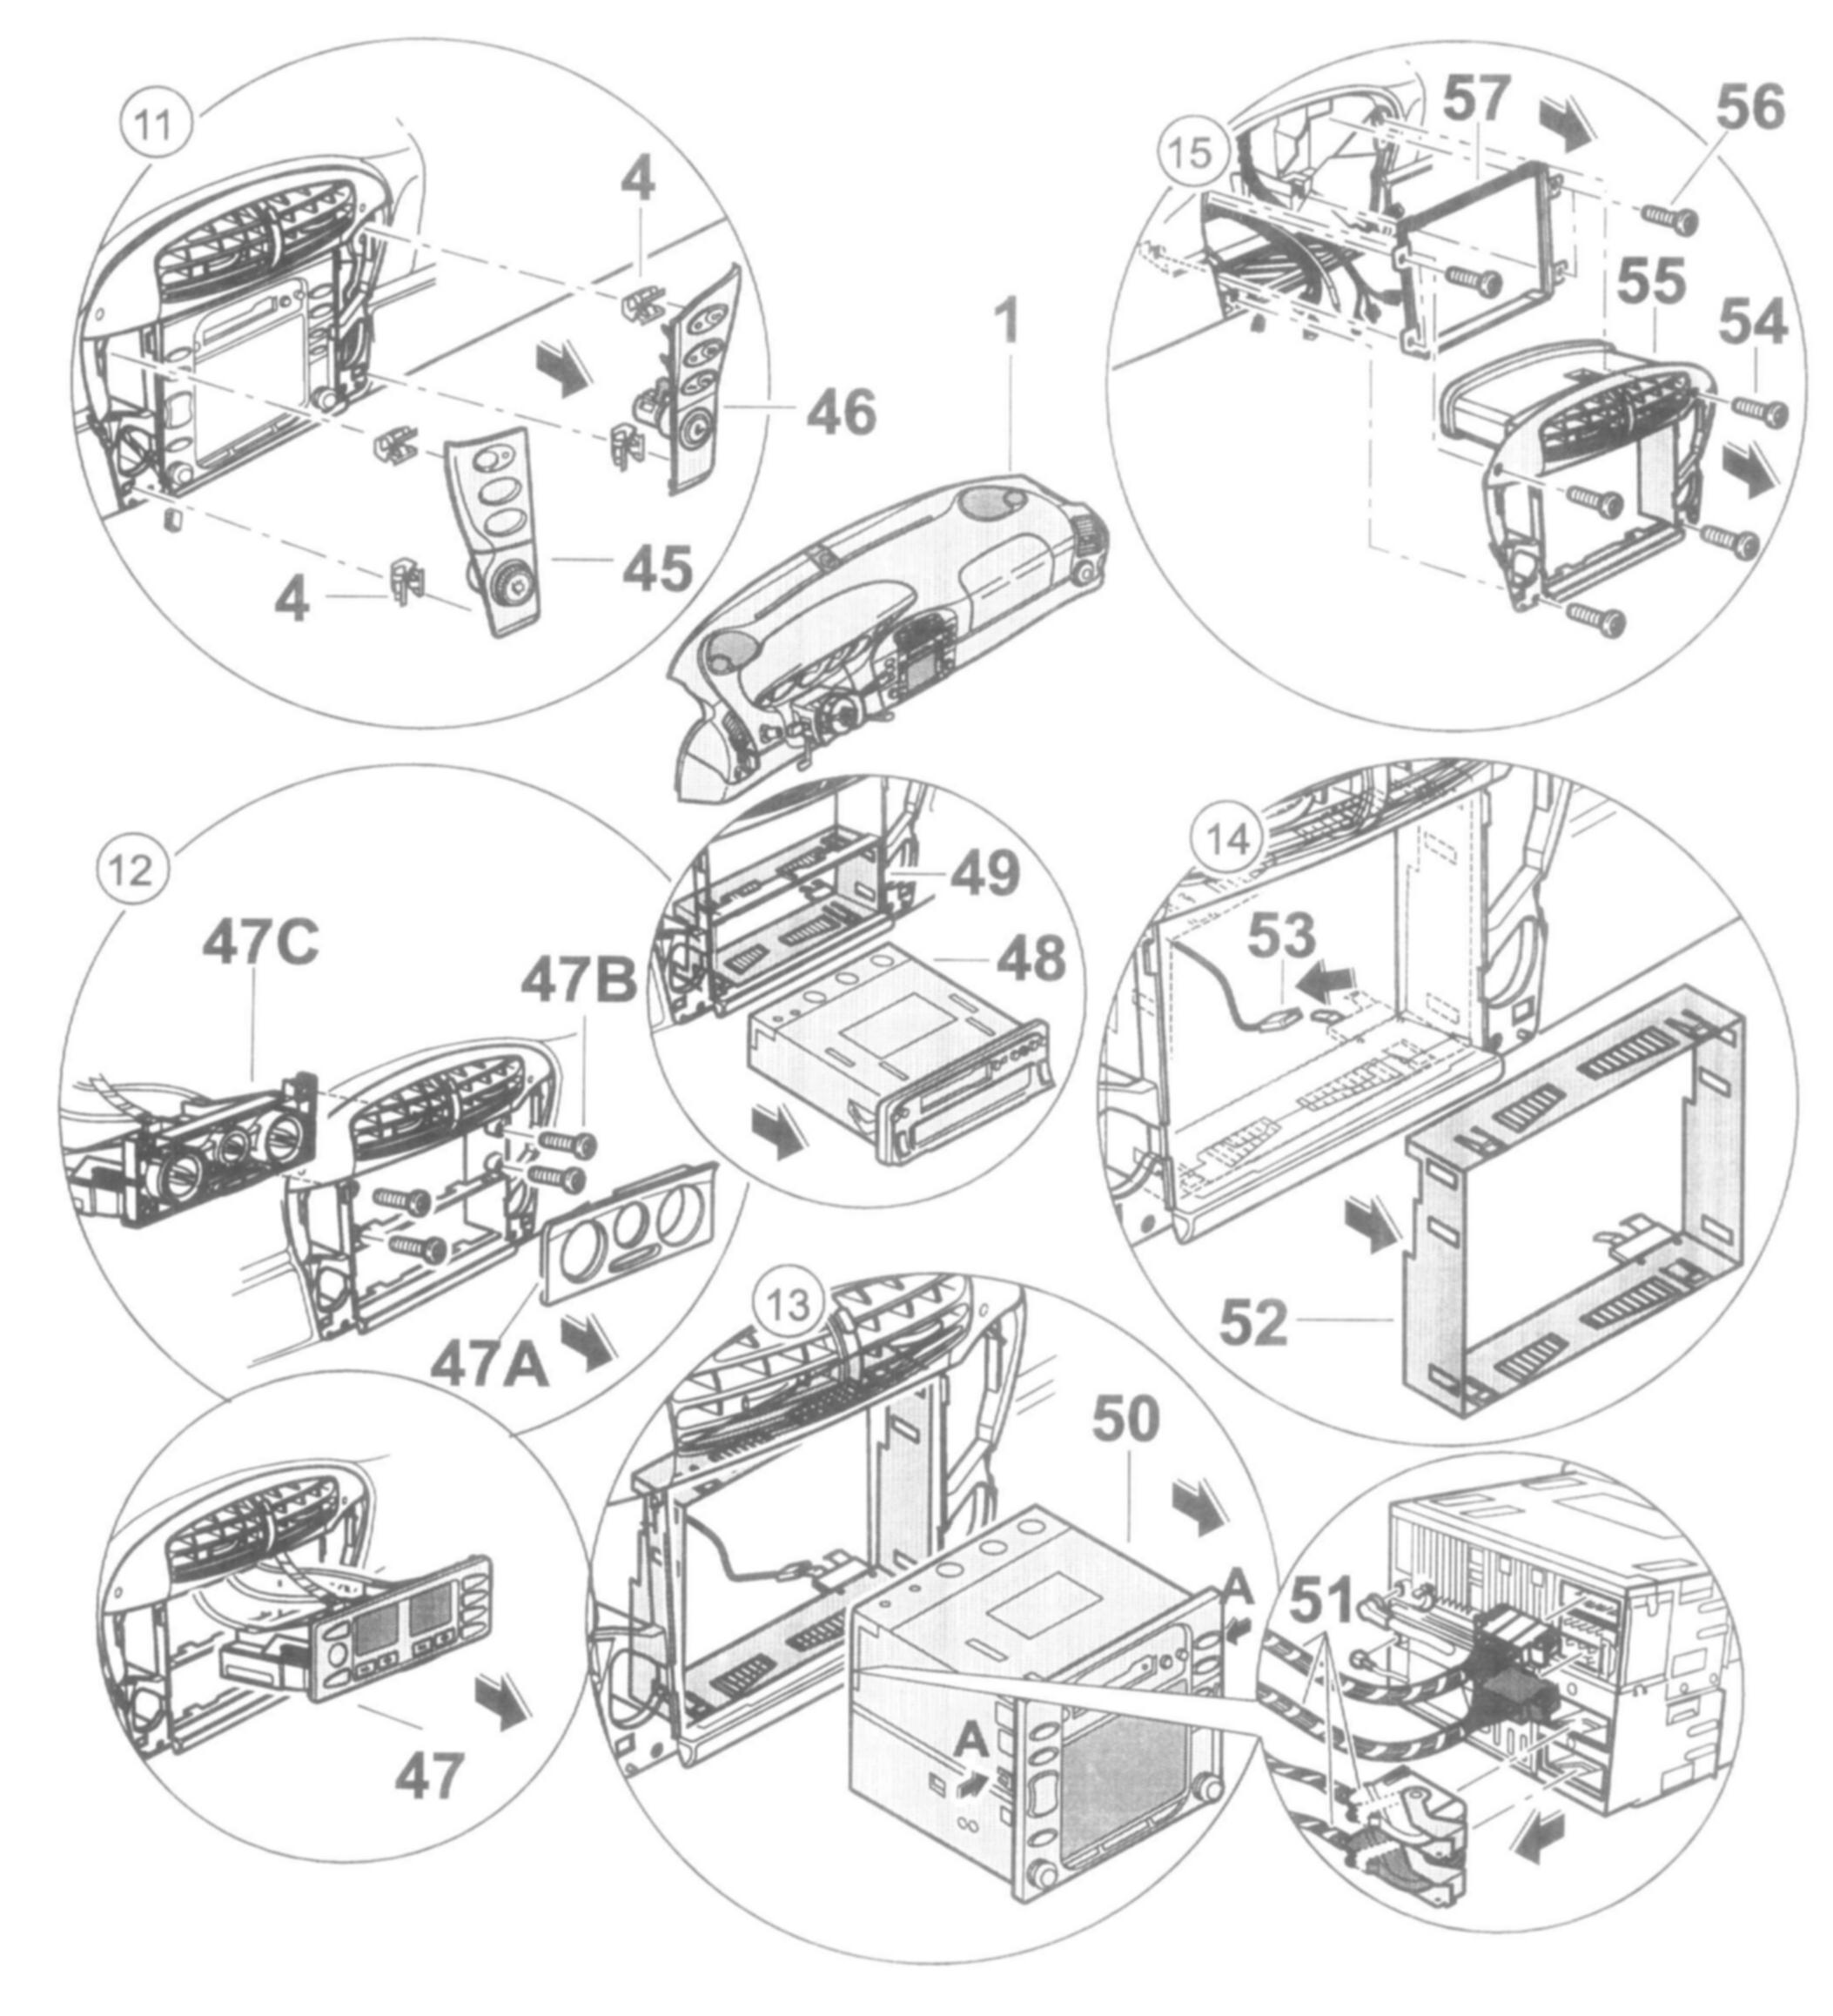 2008 dodge grand caravan air conditioning diagram html